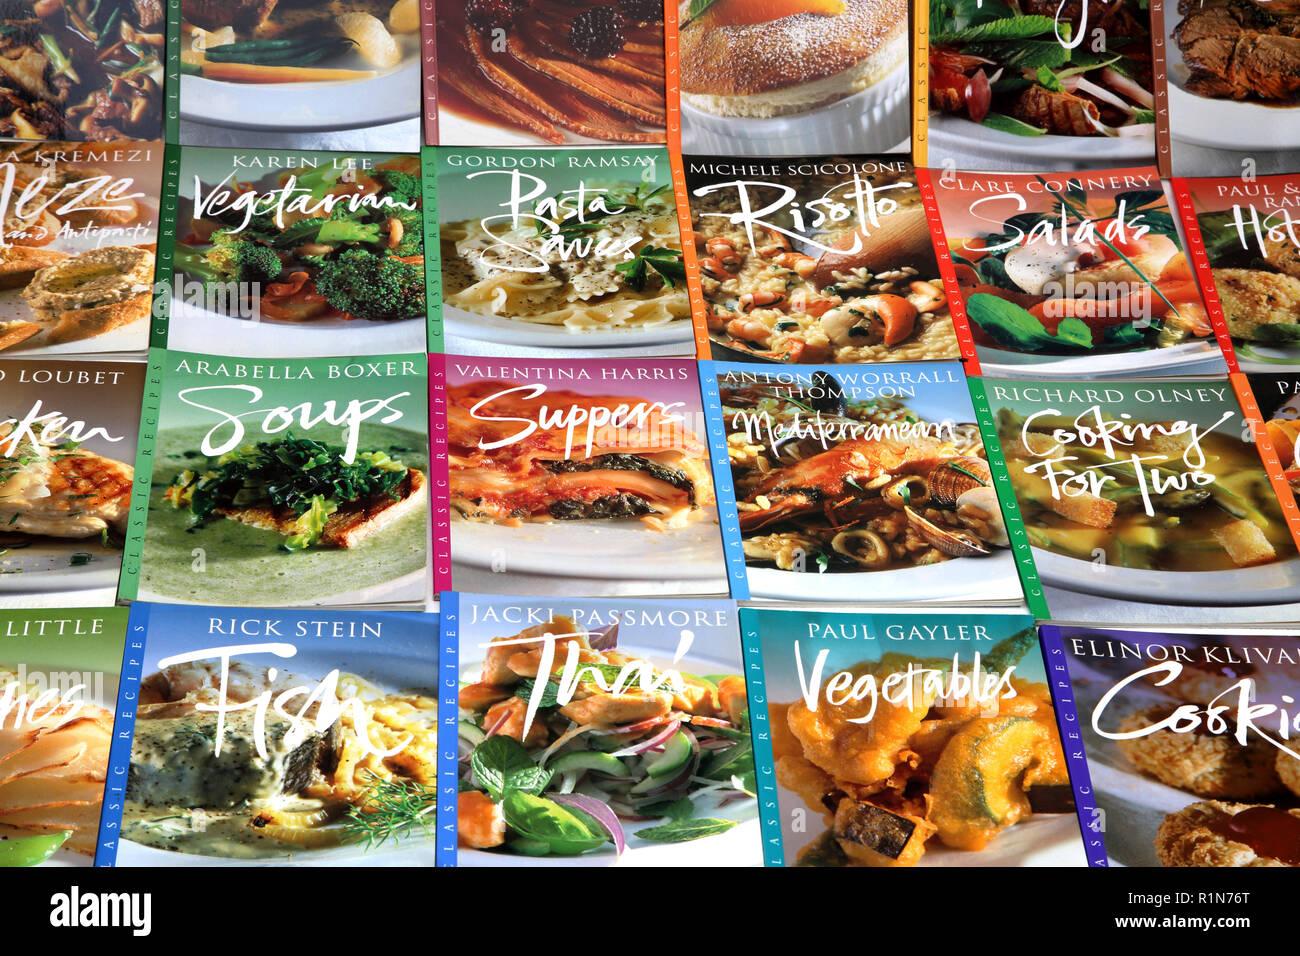 Recette classique Books Photo Stock